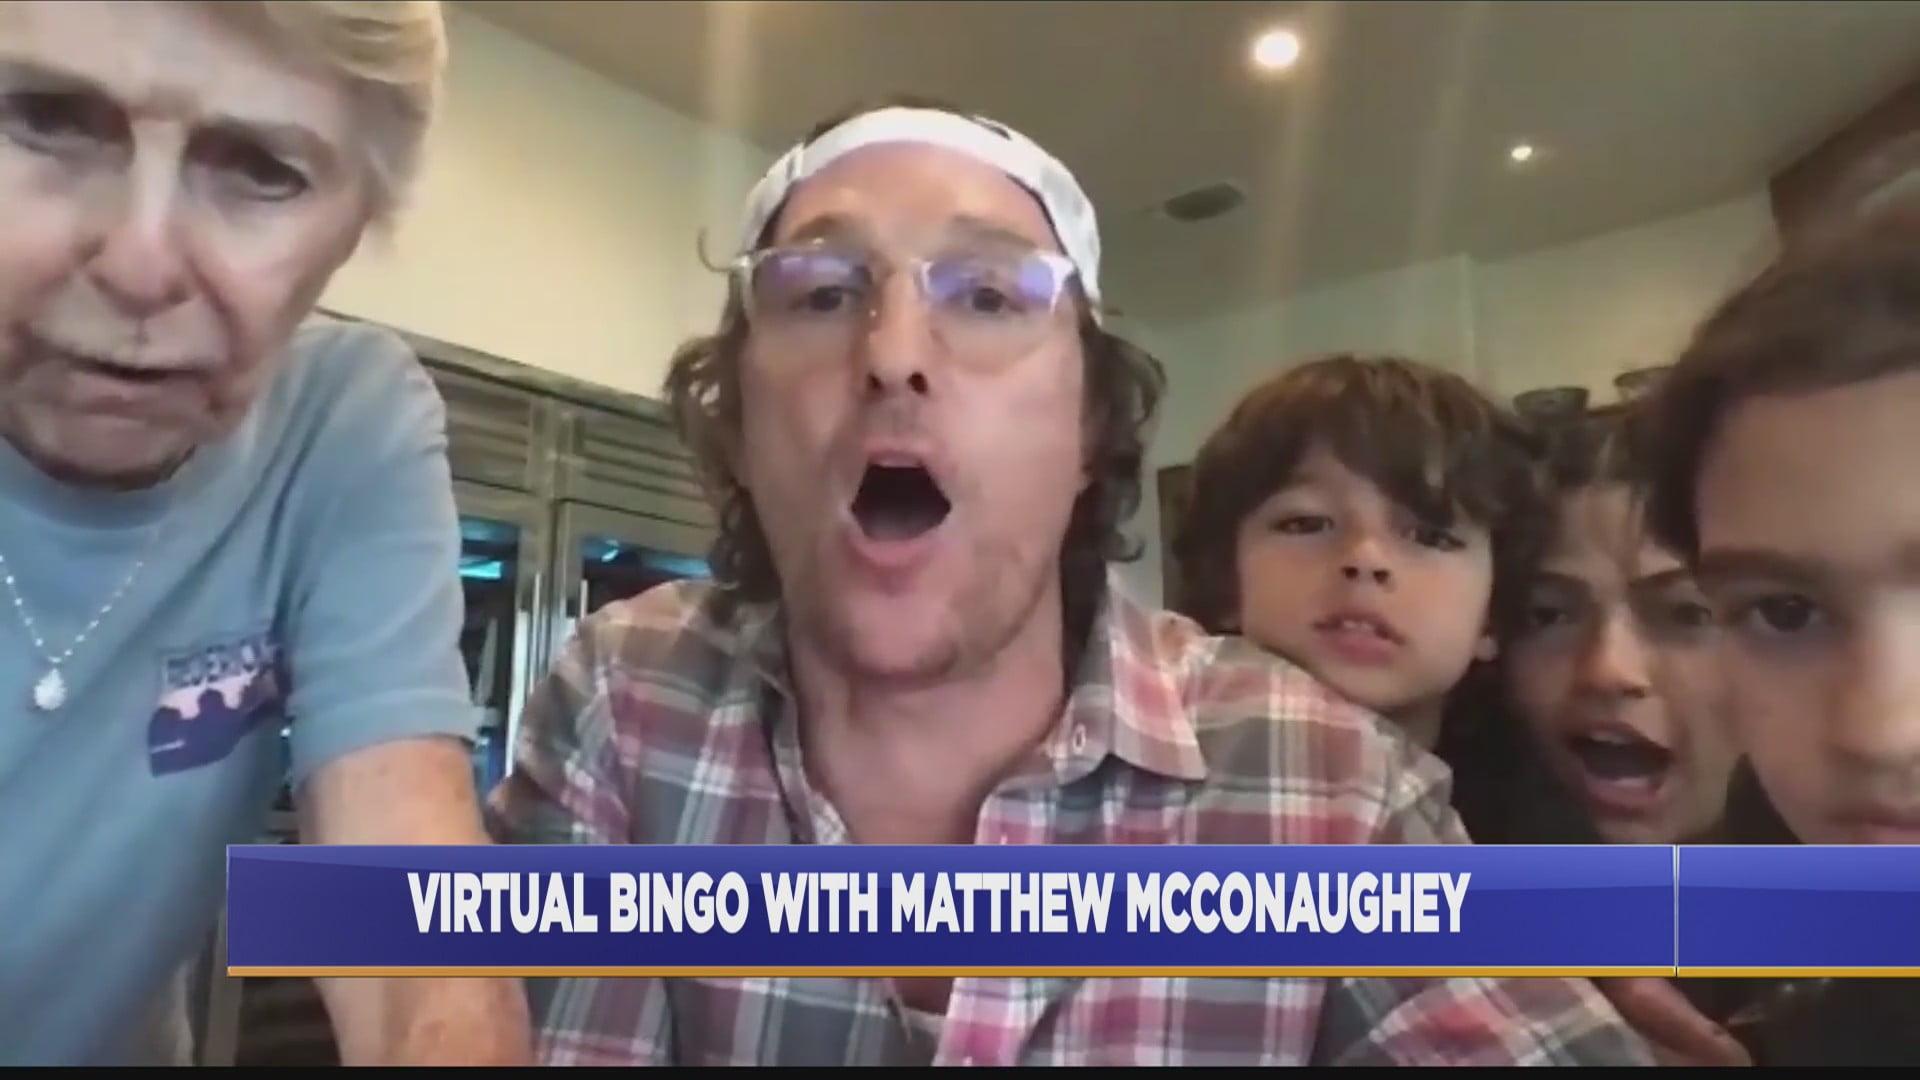 Matthew McConaughey Plays Virtual Bingo with Seniors in Isolation 1